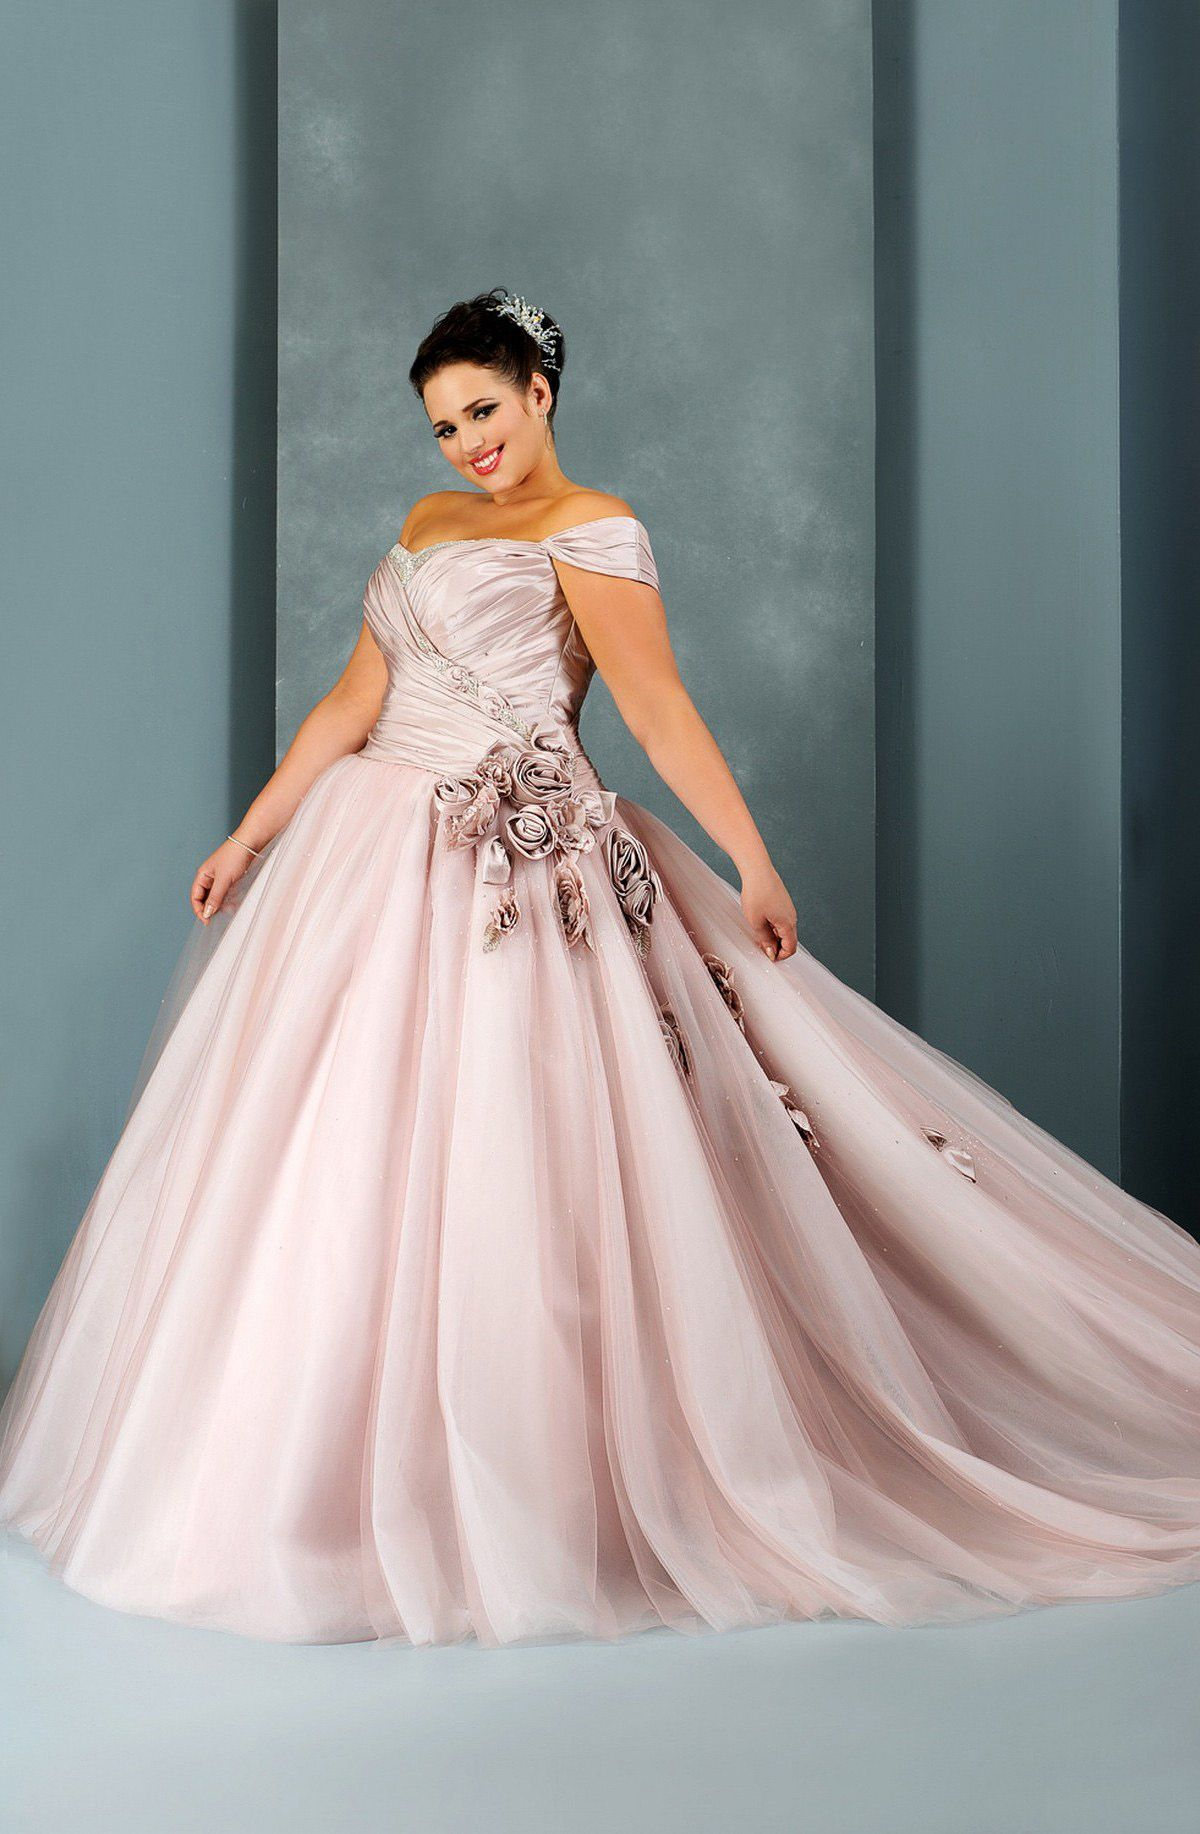 219 99 Plus Size Wedding Dresses Plus Size Wedding Dresses Cheap Plus S Traditional Wedding Dresses Wedding Dresses Plus Size Colored Wedding Dresses